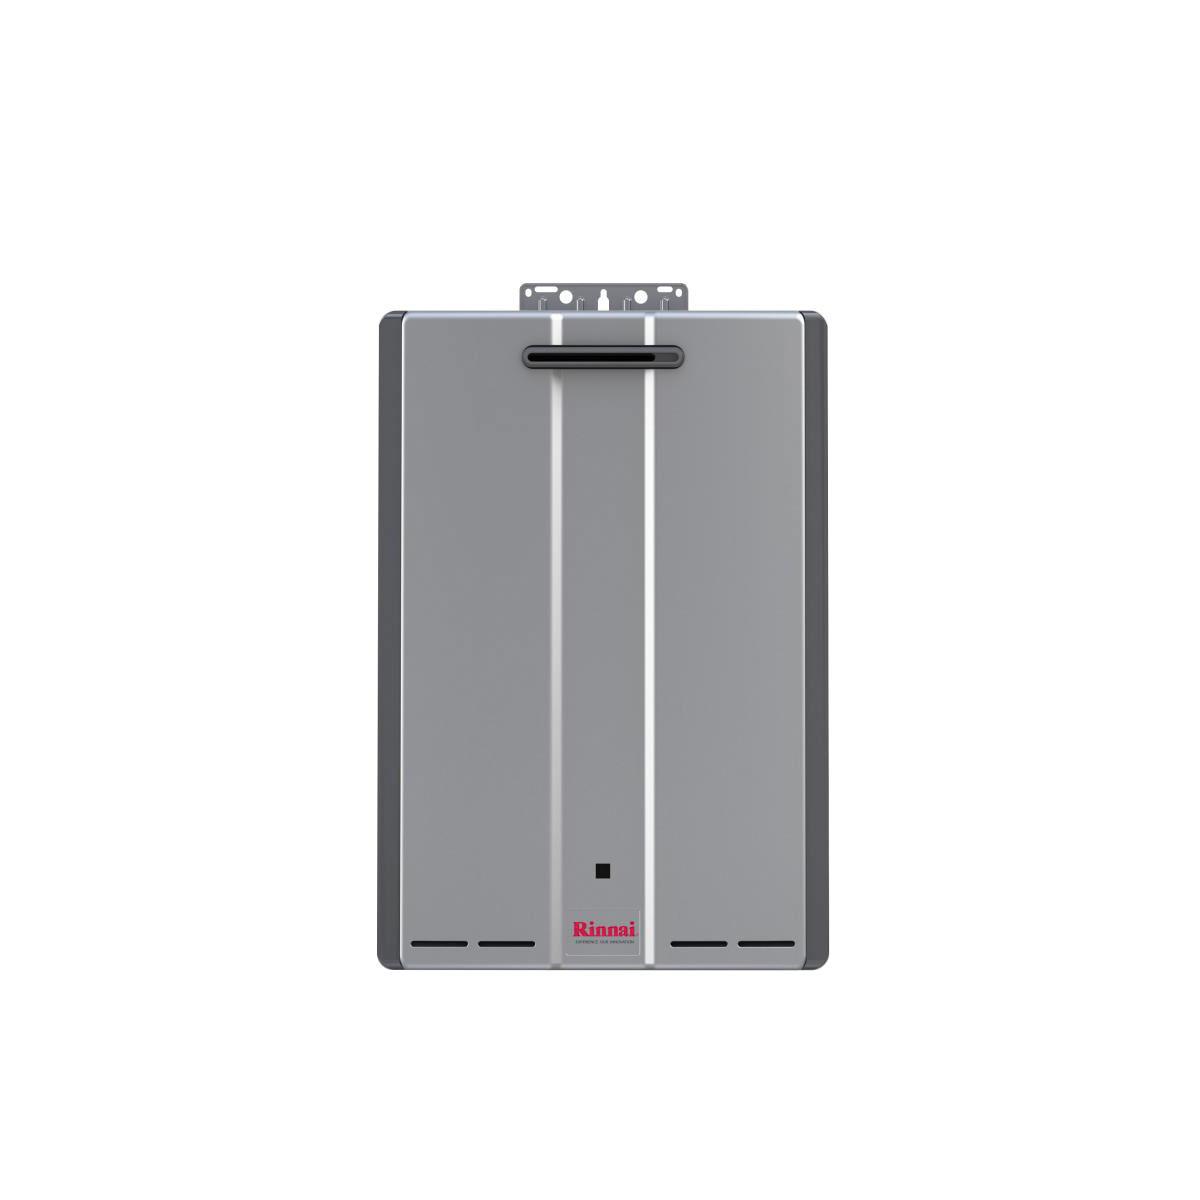 Rinnai® SENSEI™ RUR199eN SE+ Super High Efficiency Tankless Water Heater, Natural Gas Fuel, 199000 Btu/hr, Outdoor, Condensing, 11 gpm, 0.93, Residential